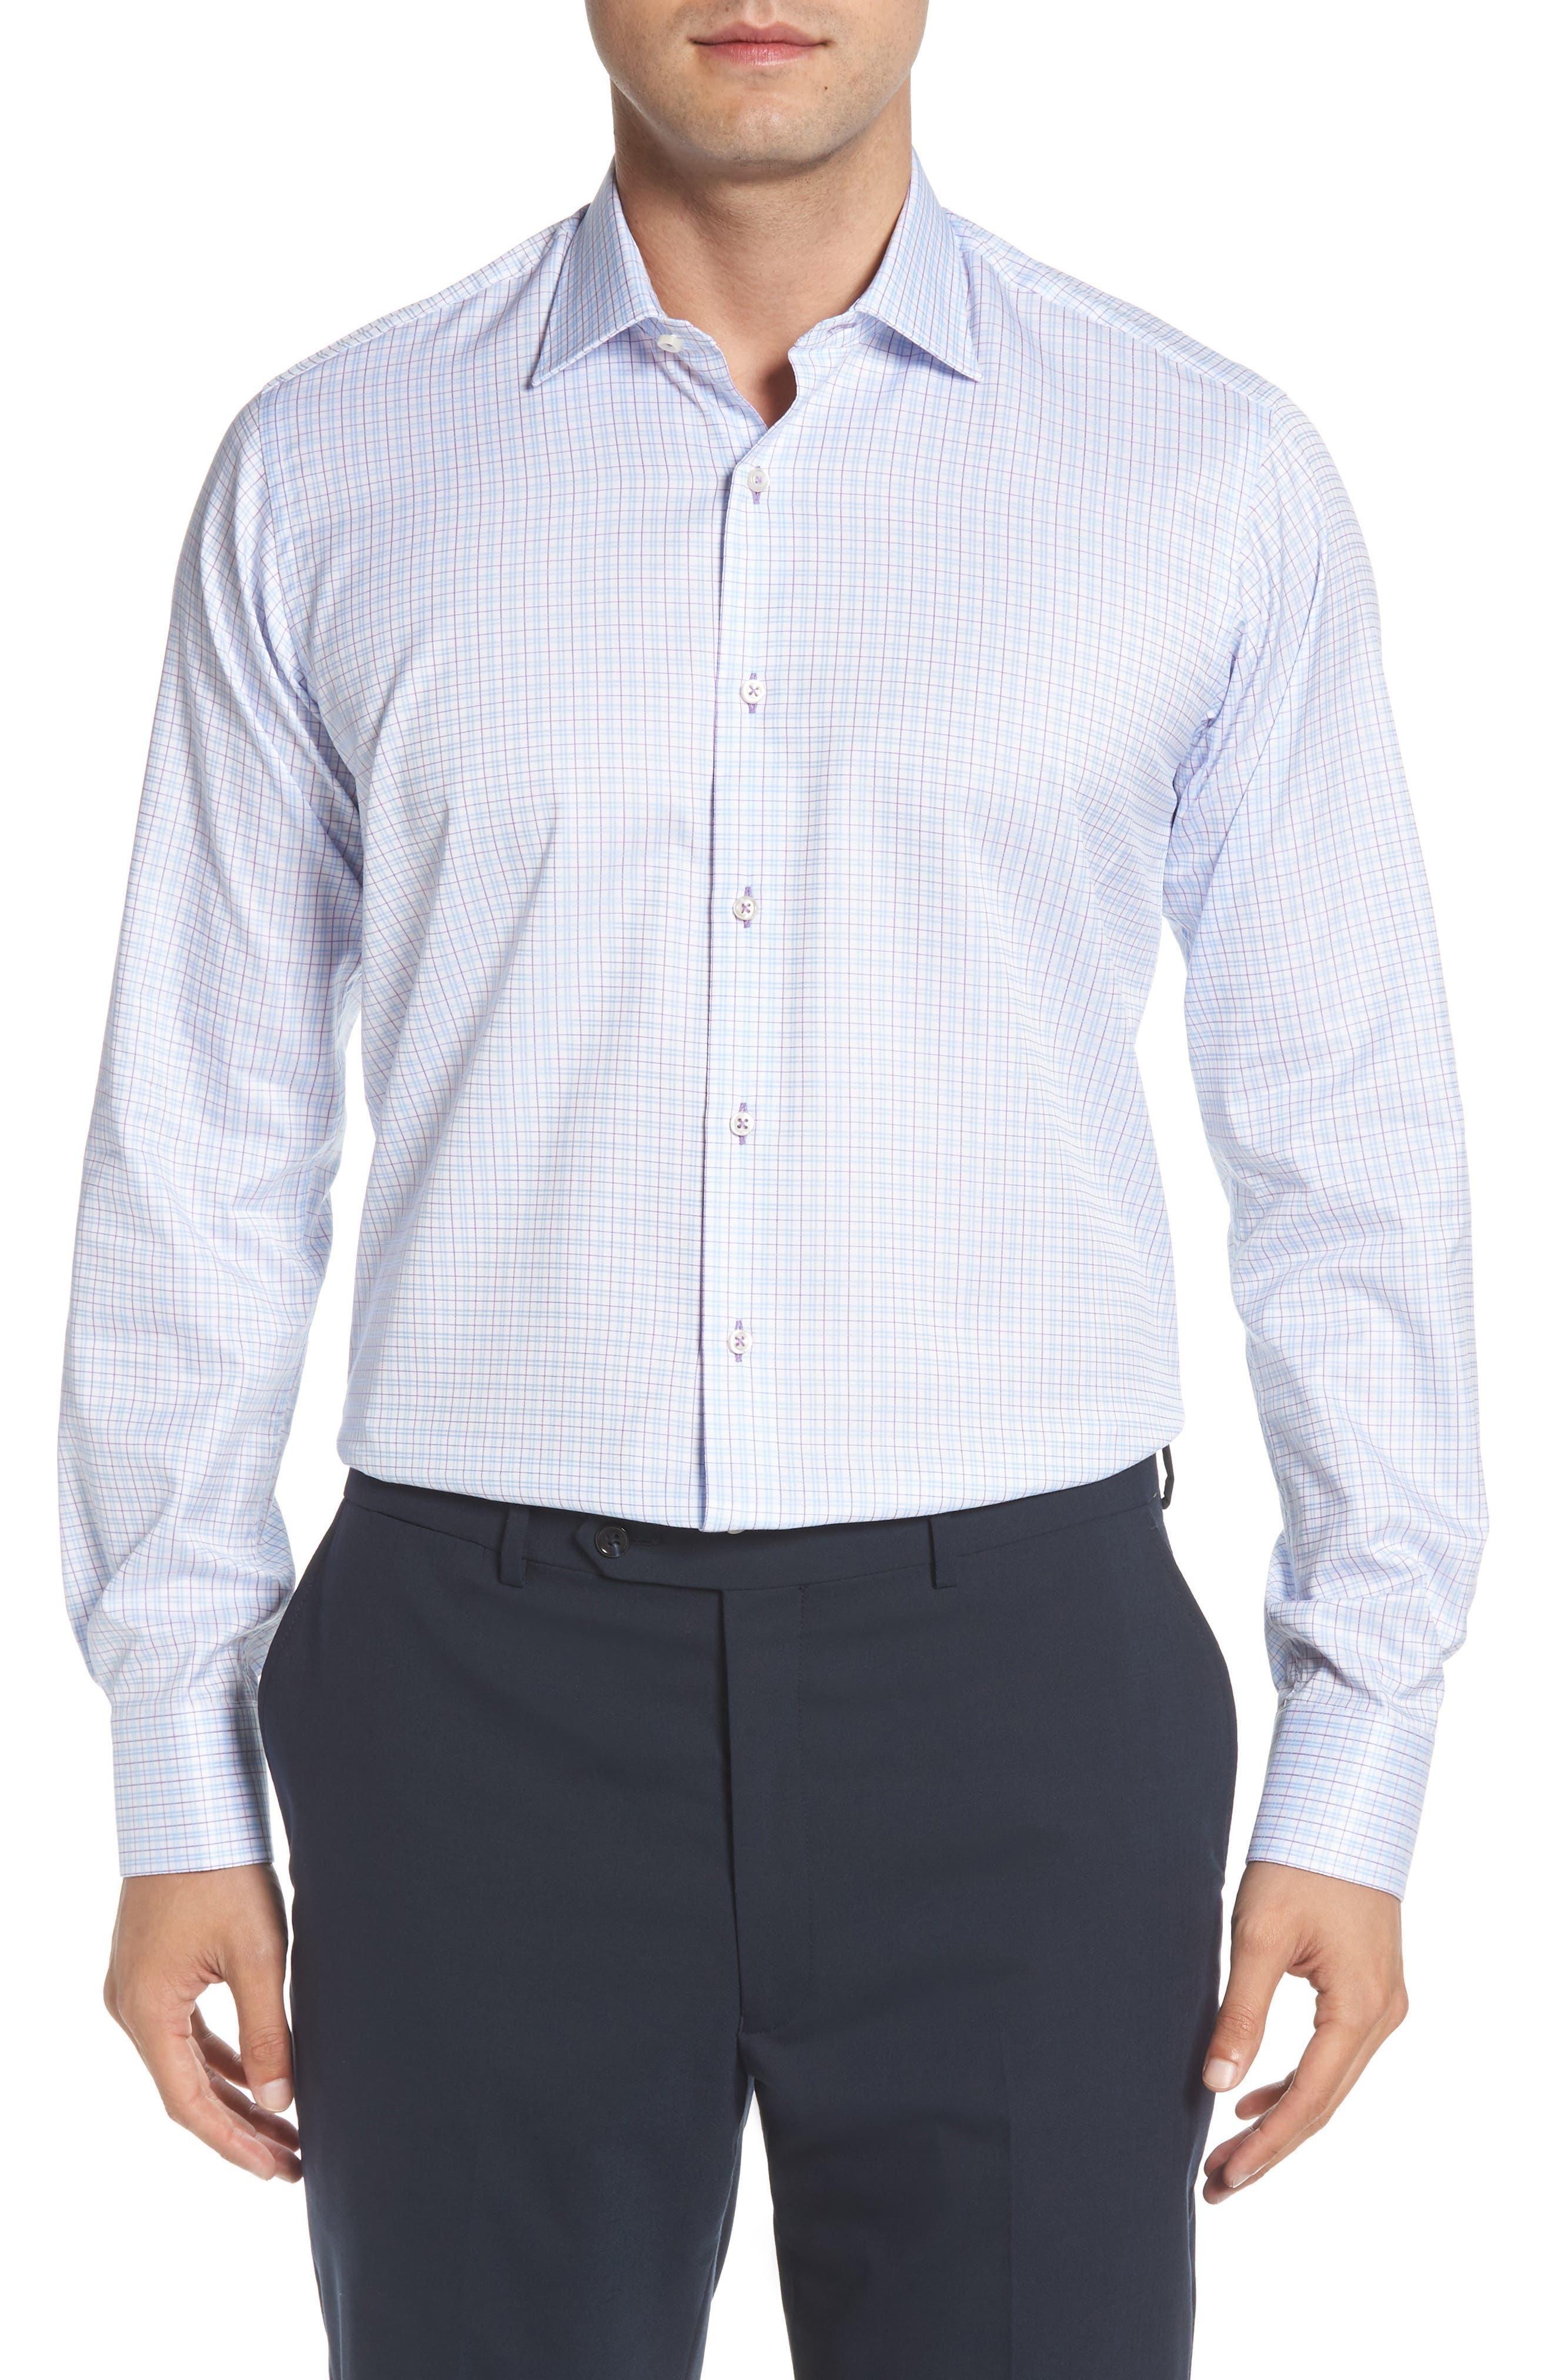 Regular Fit Check Dress Shirt,                         Main,                         color, WHITE MULTI